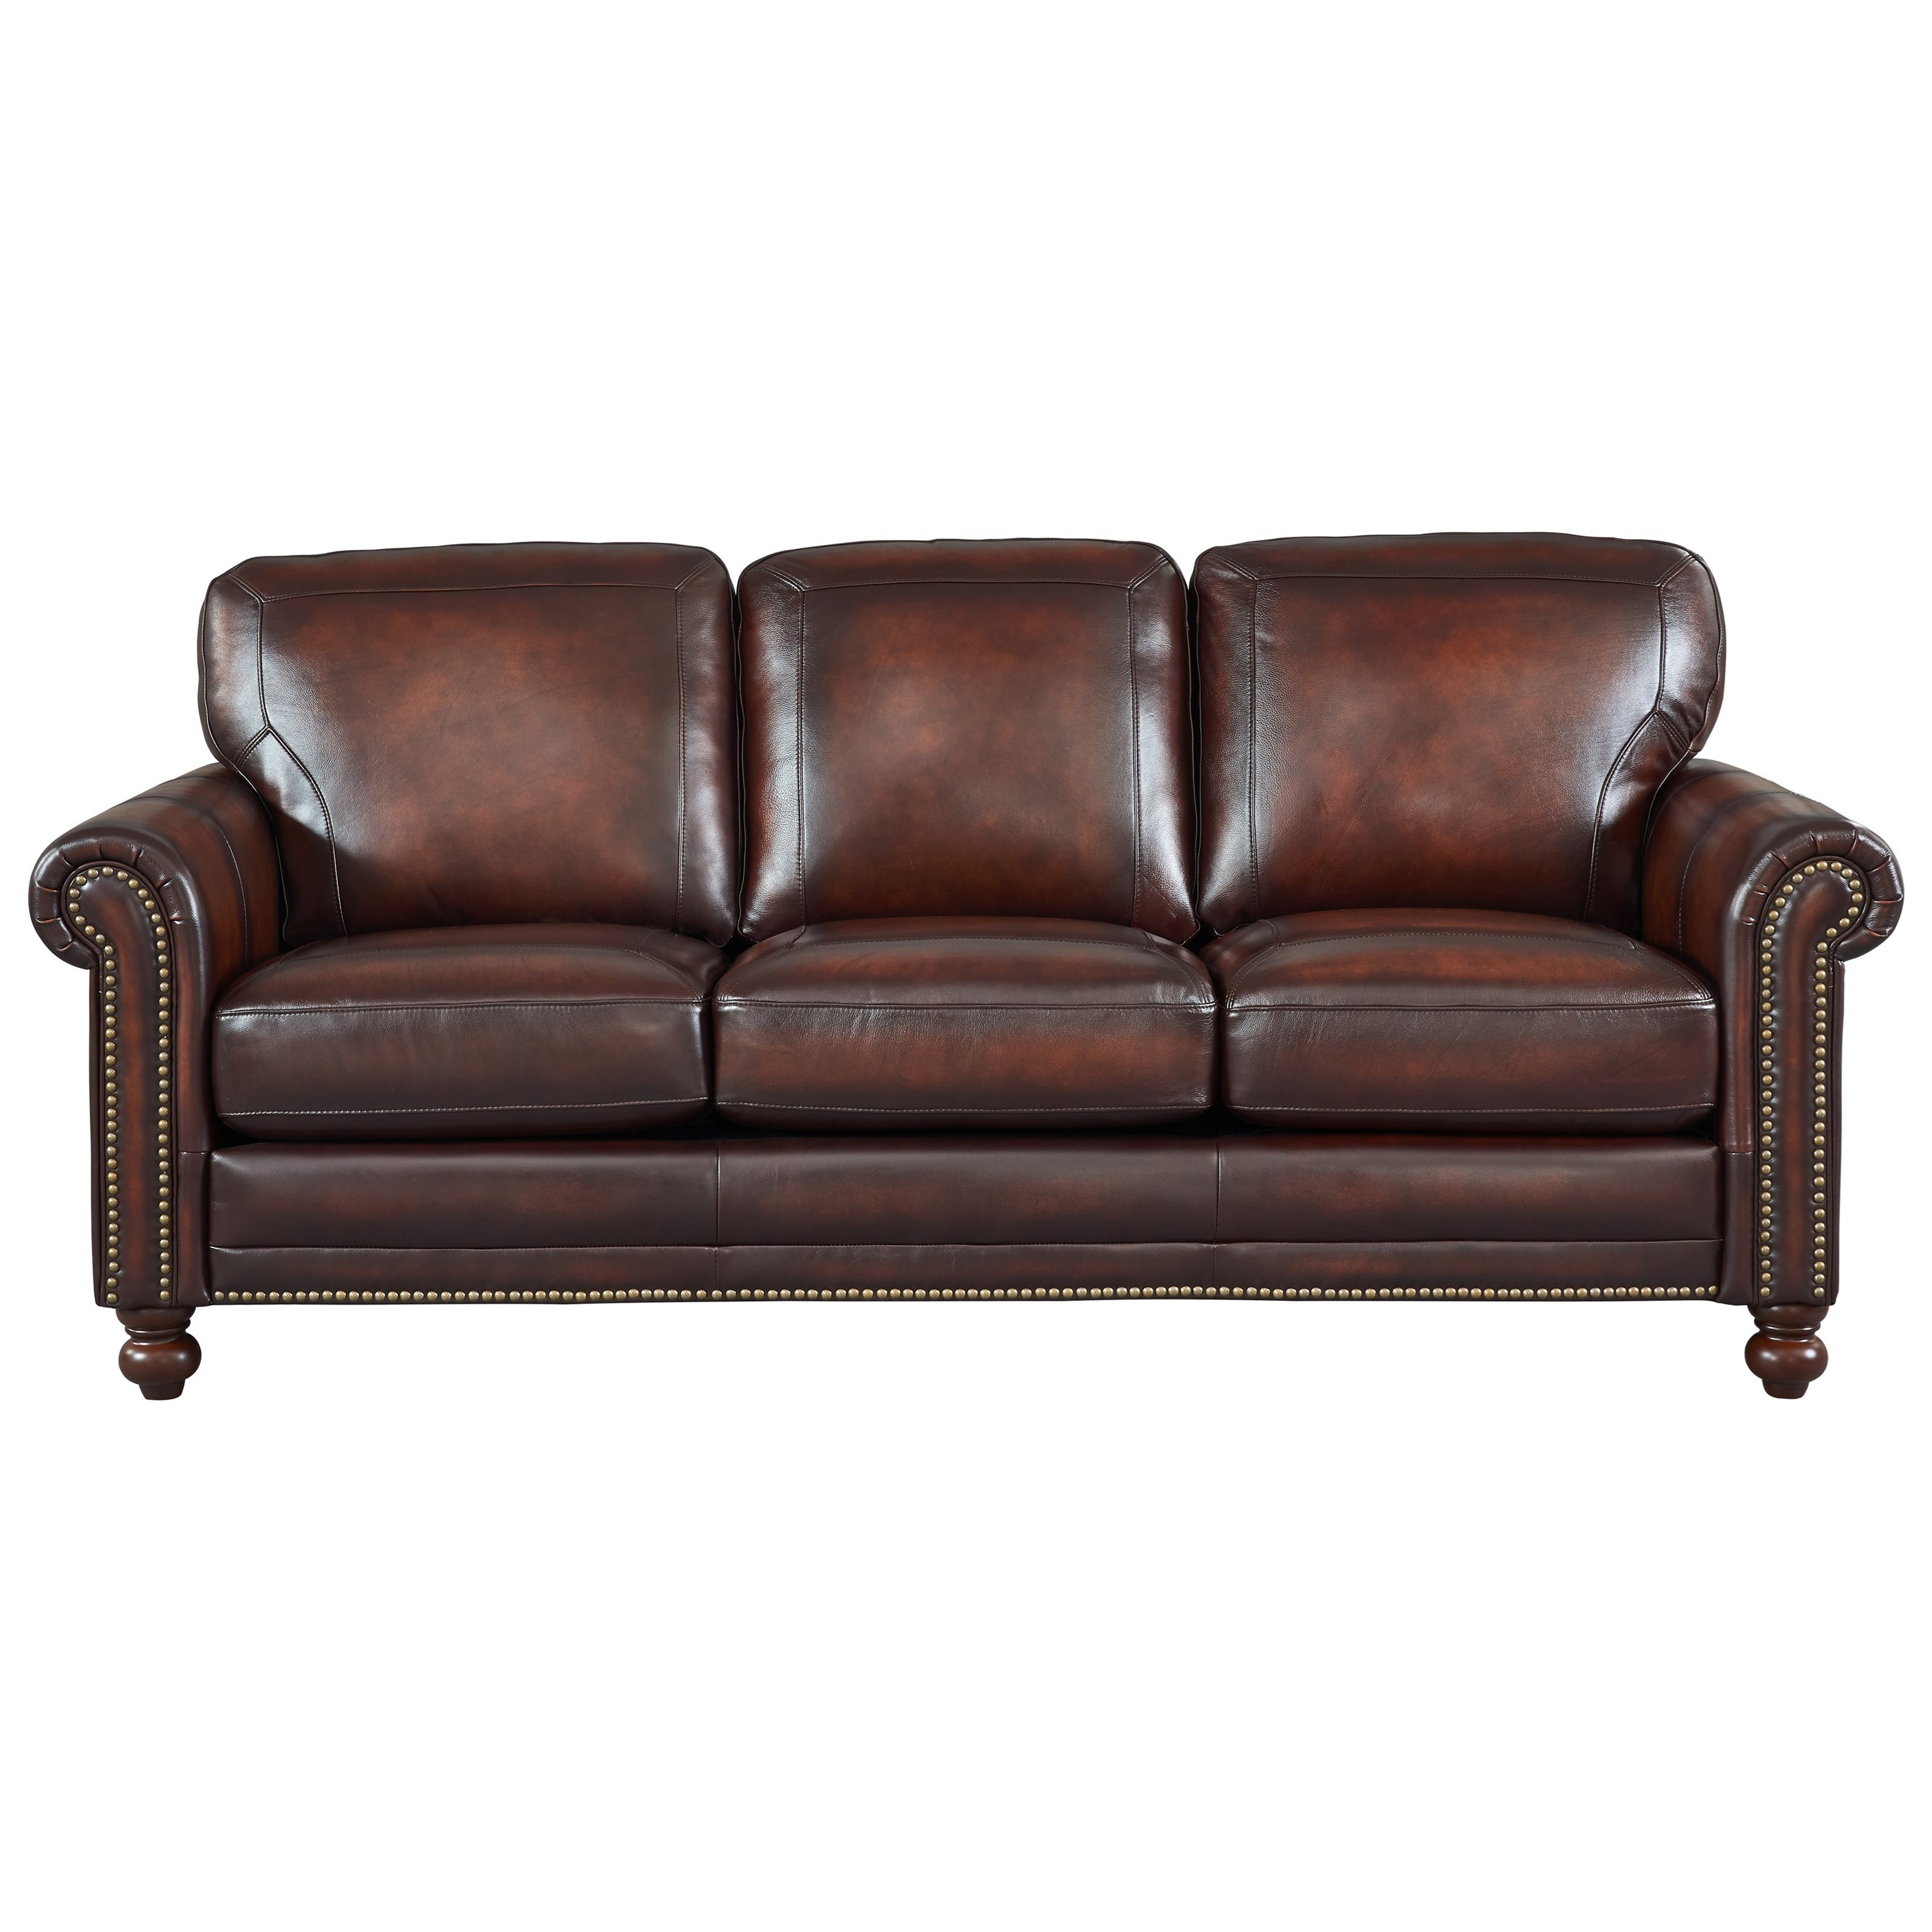 Hampton Sofa by Leather Italia USA at Johnny Janosik